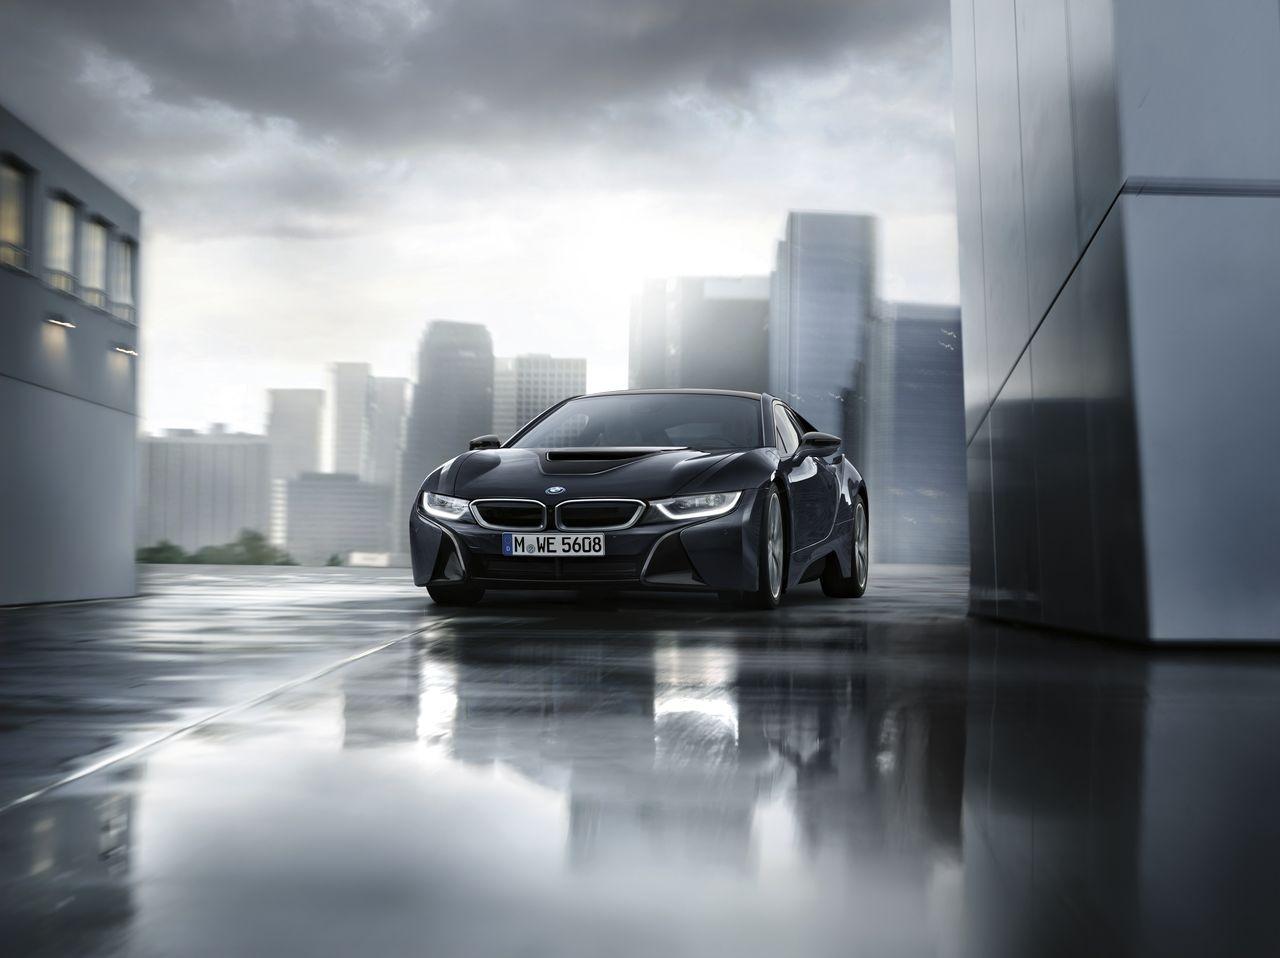 BMW i8 Protonic Dark Silver Edition